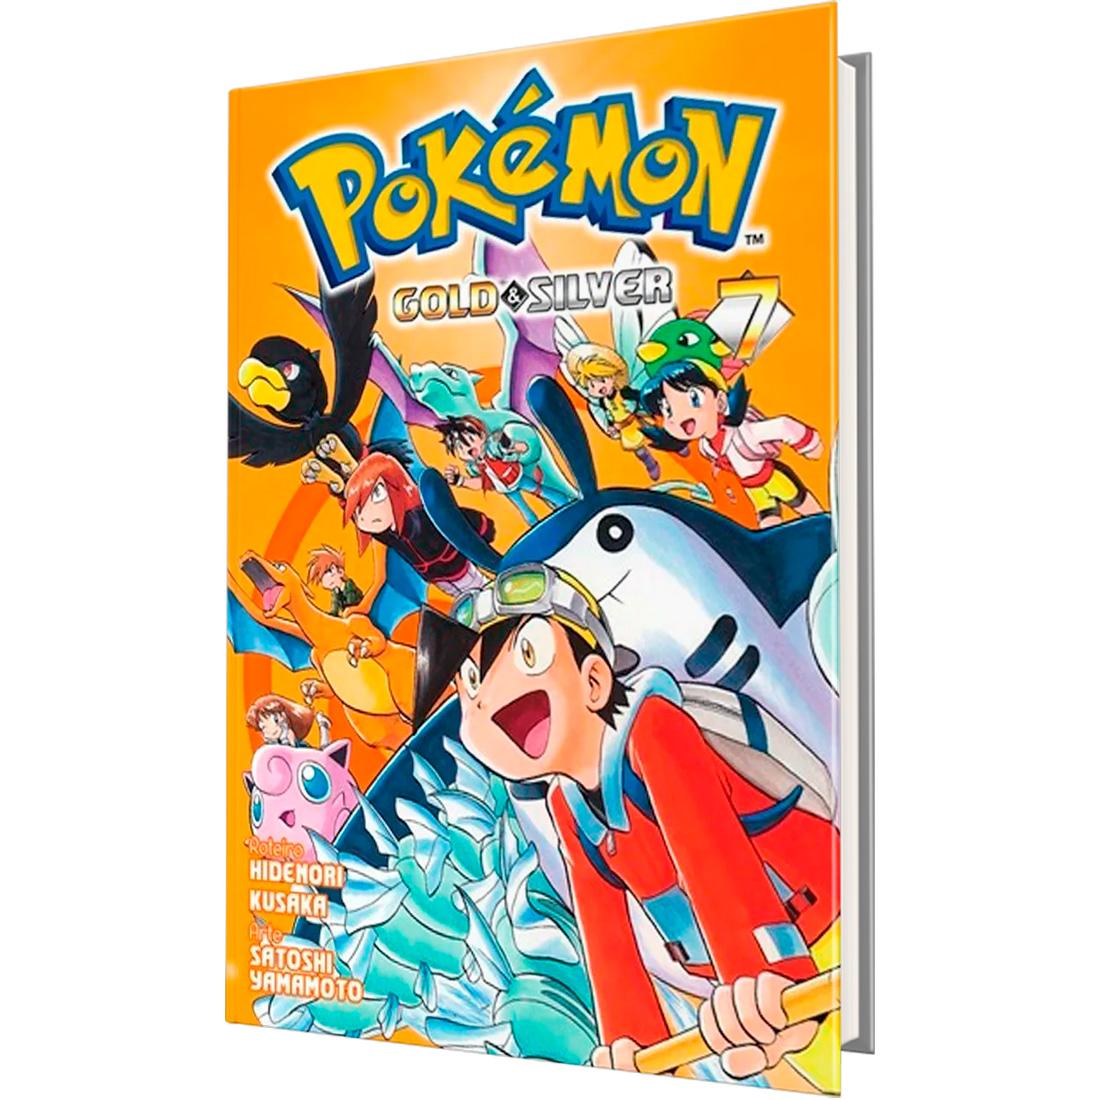 Pokémon Gold and Silver Vol. 7